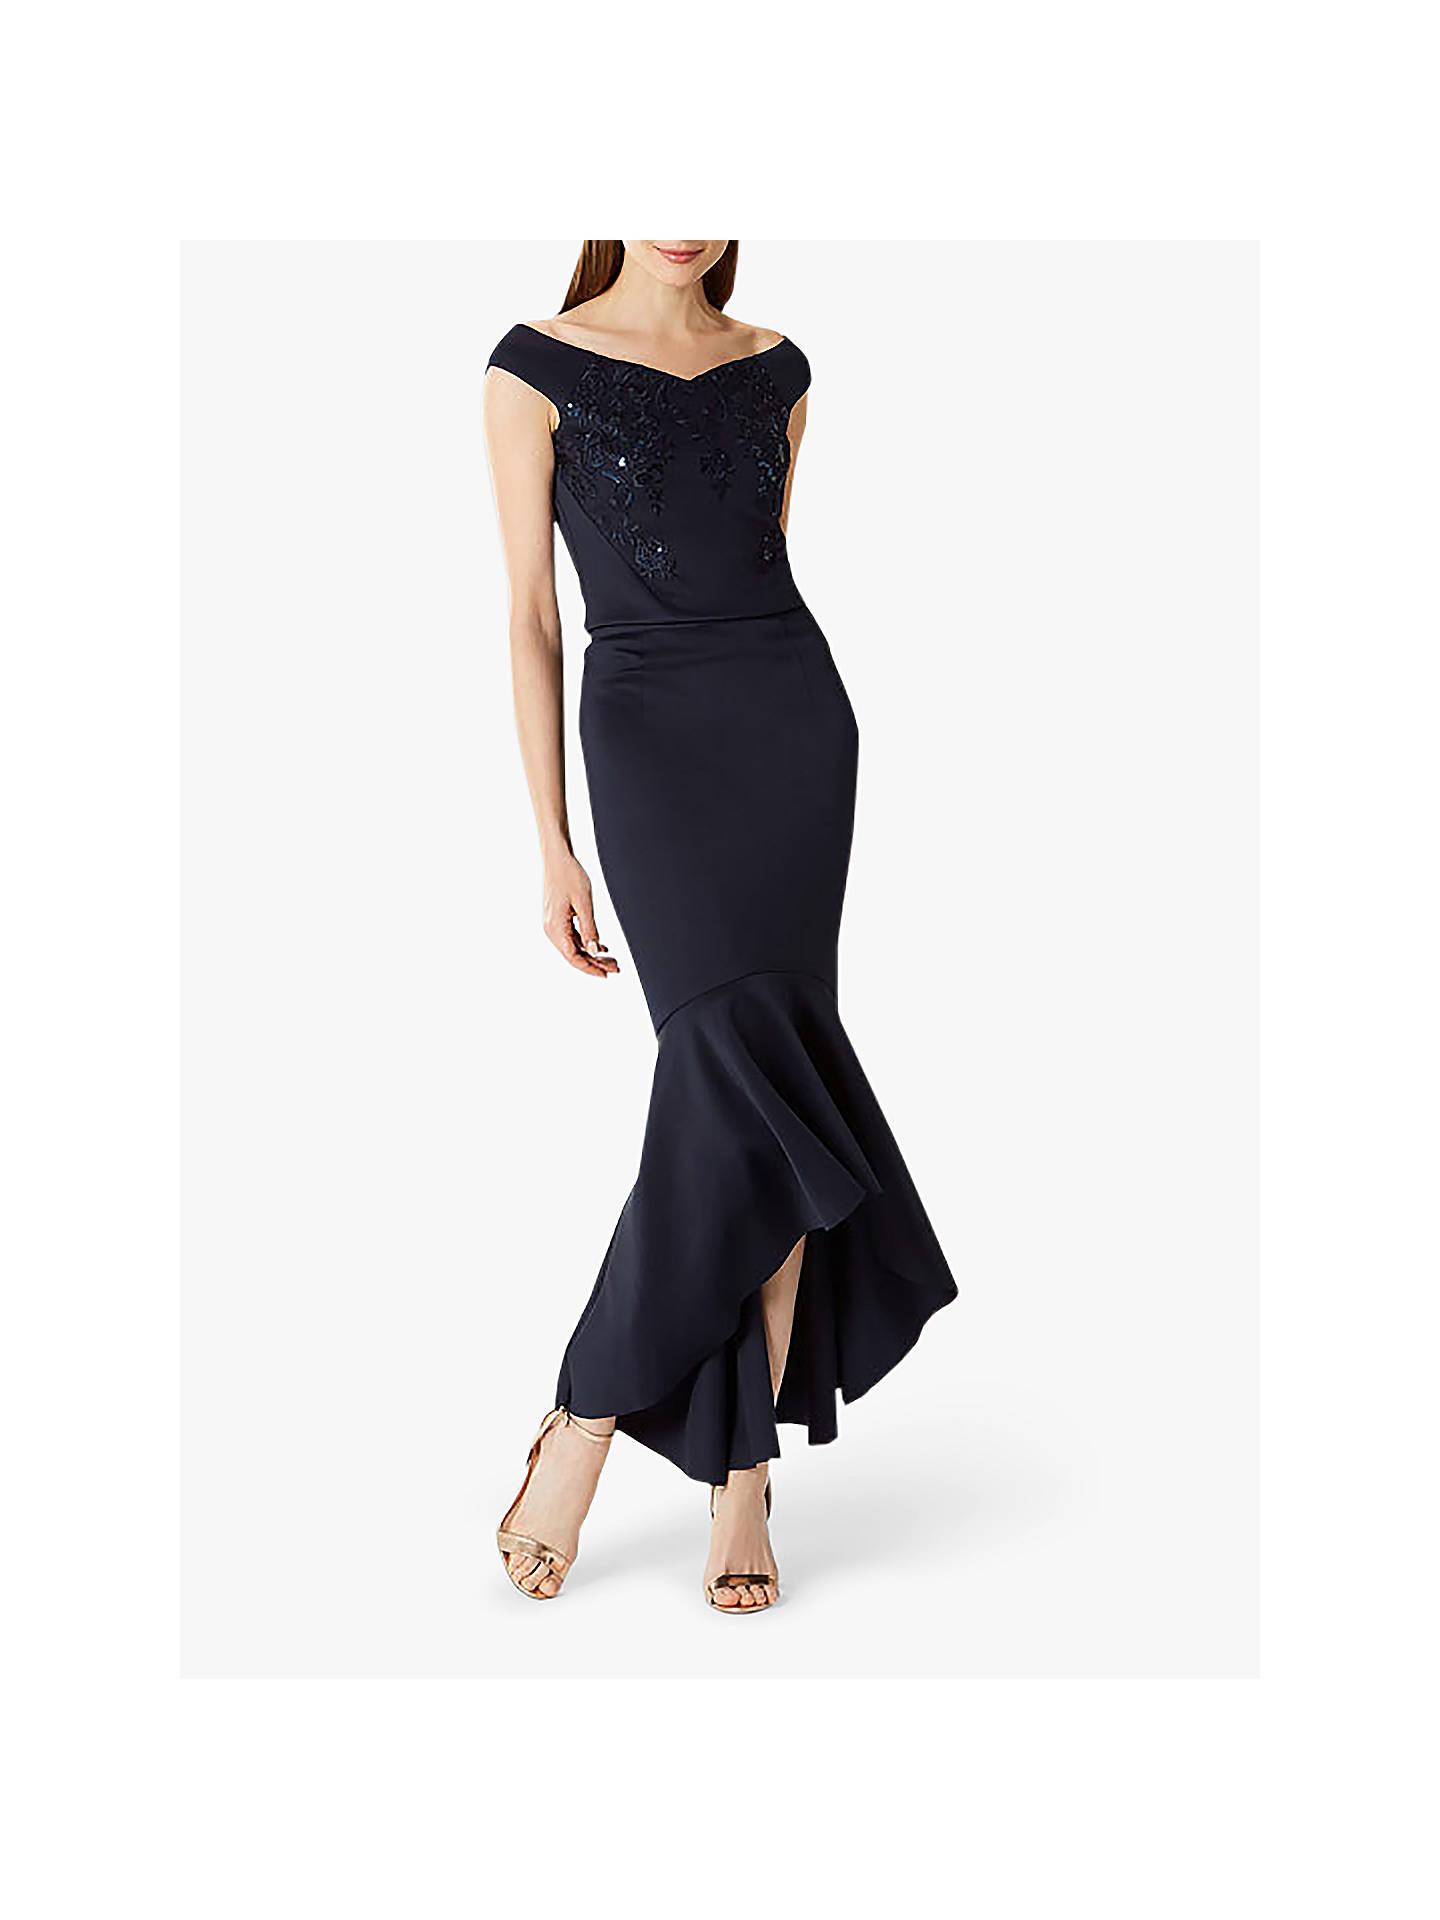 c8560389f3 Buy Coast Lilli Fishtail Skirt, Navy, 12 Online at johnlewis.com ...